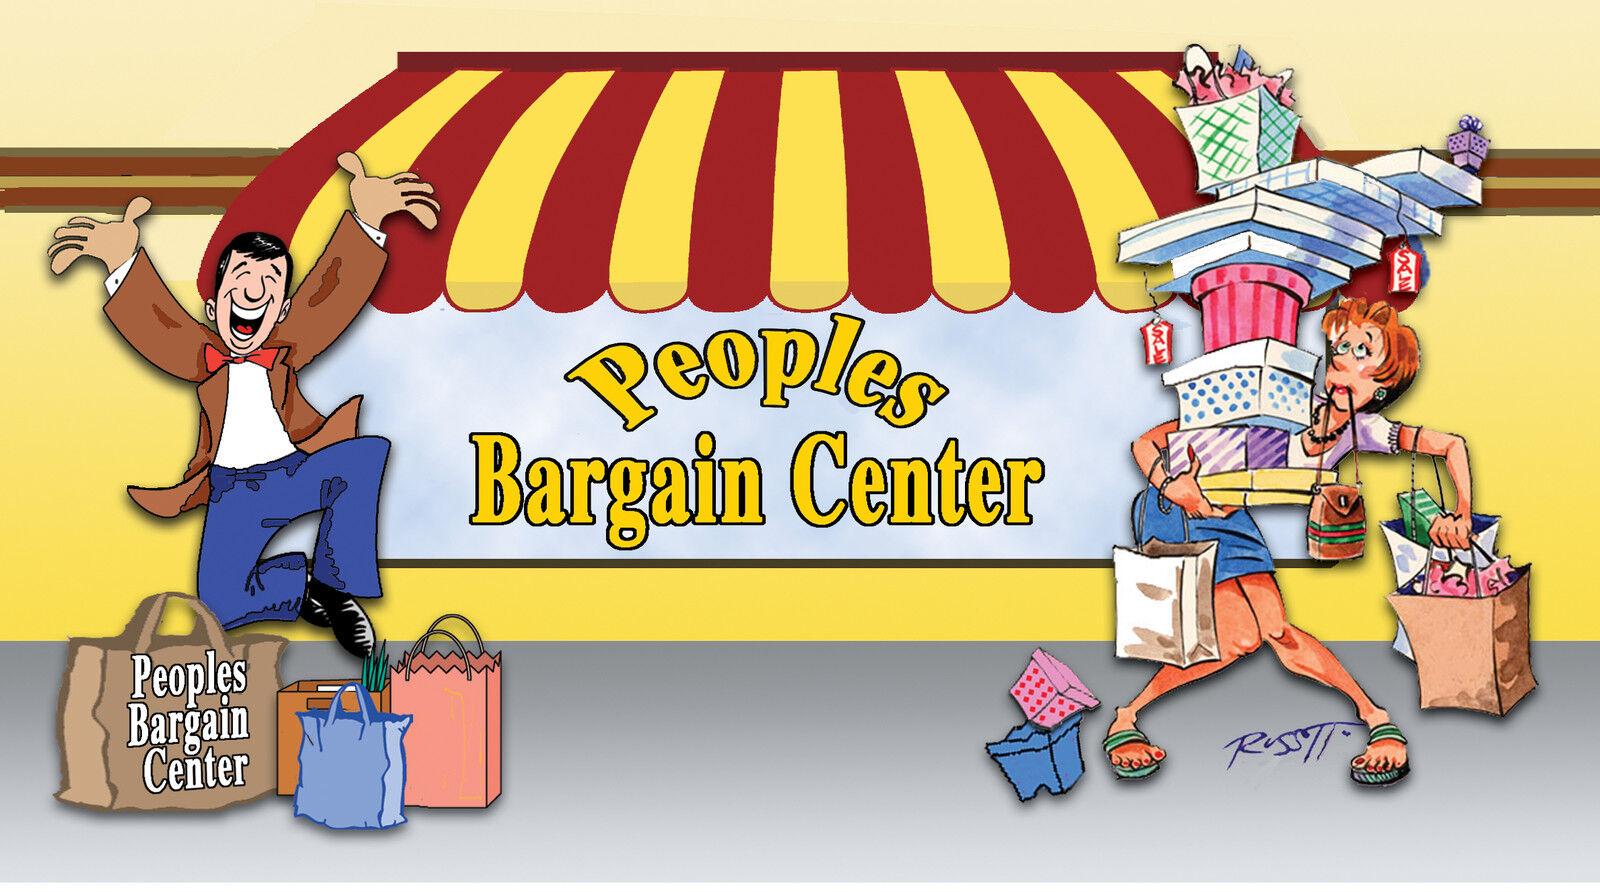 People's Bargain Center